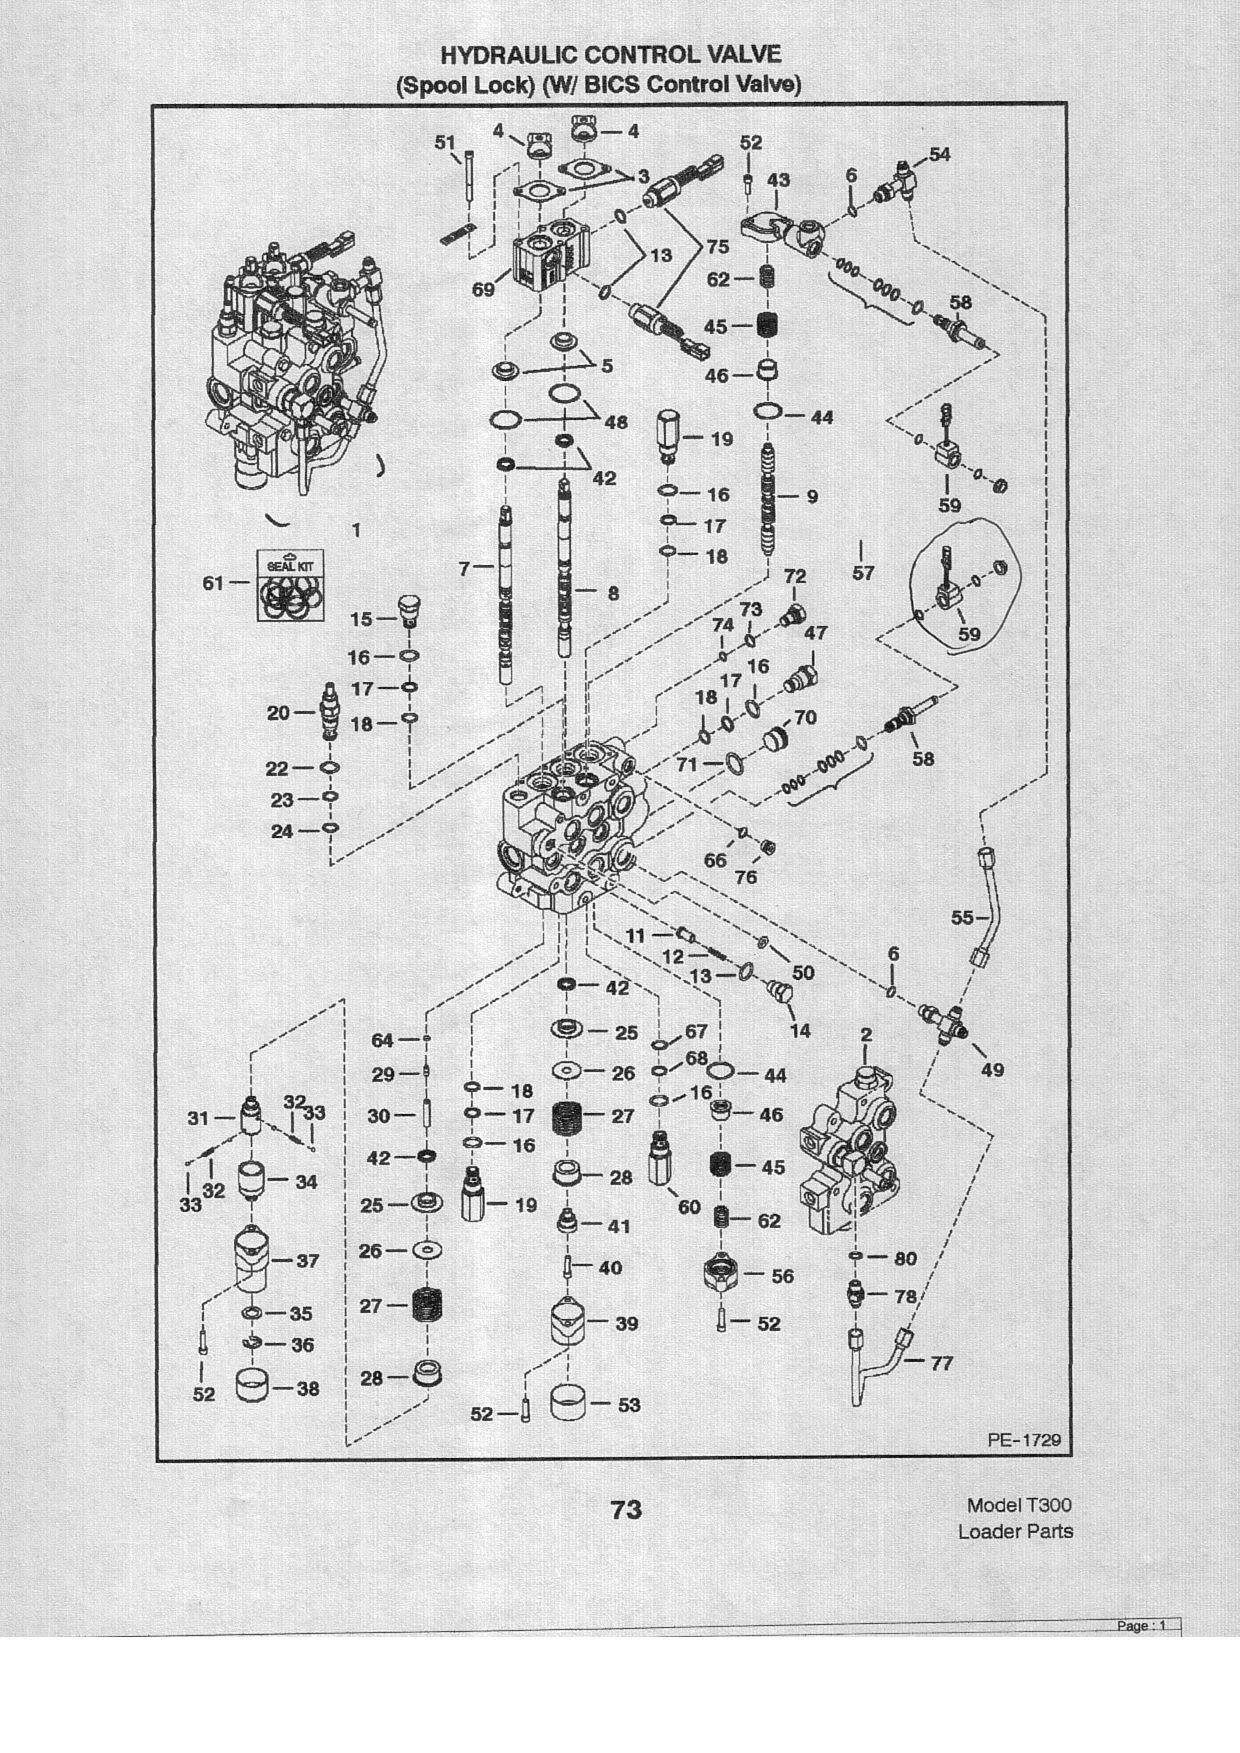 Bobcat 863 Hydraulic Control Valve Diagram